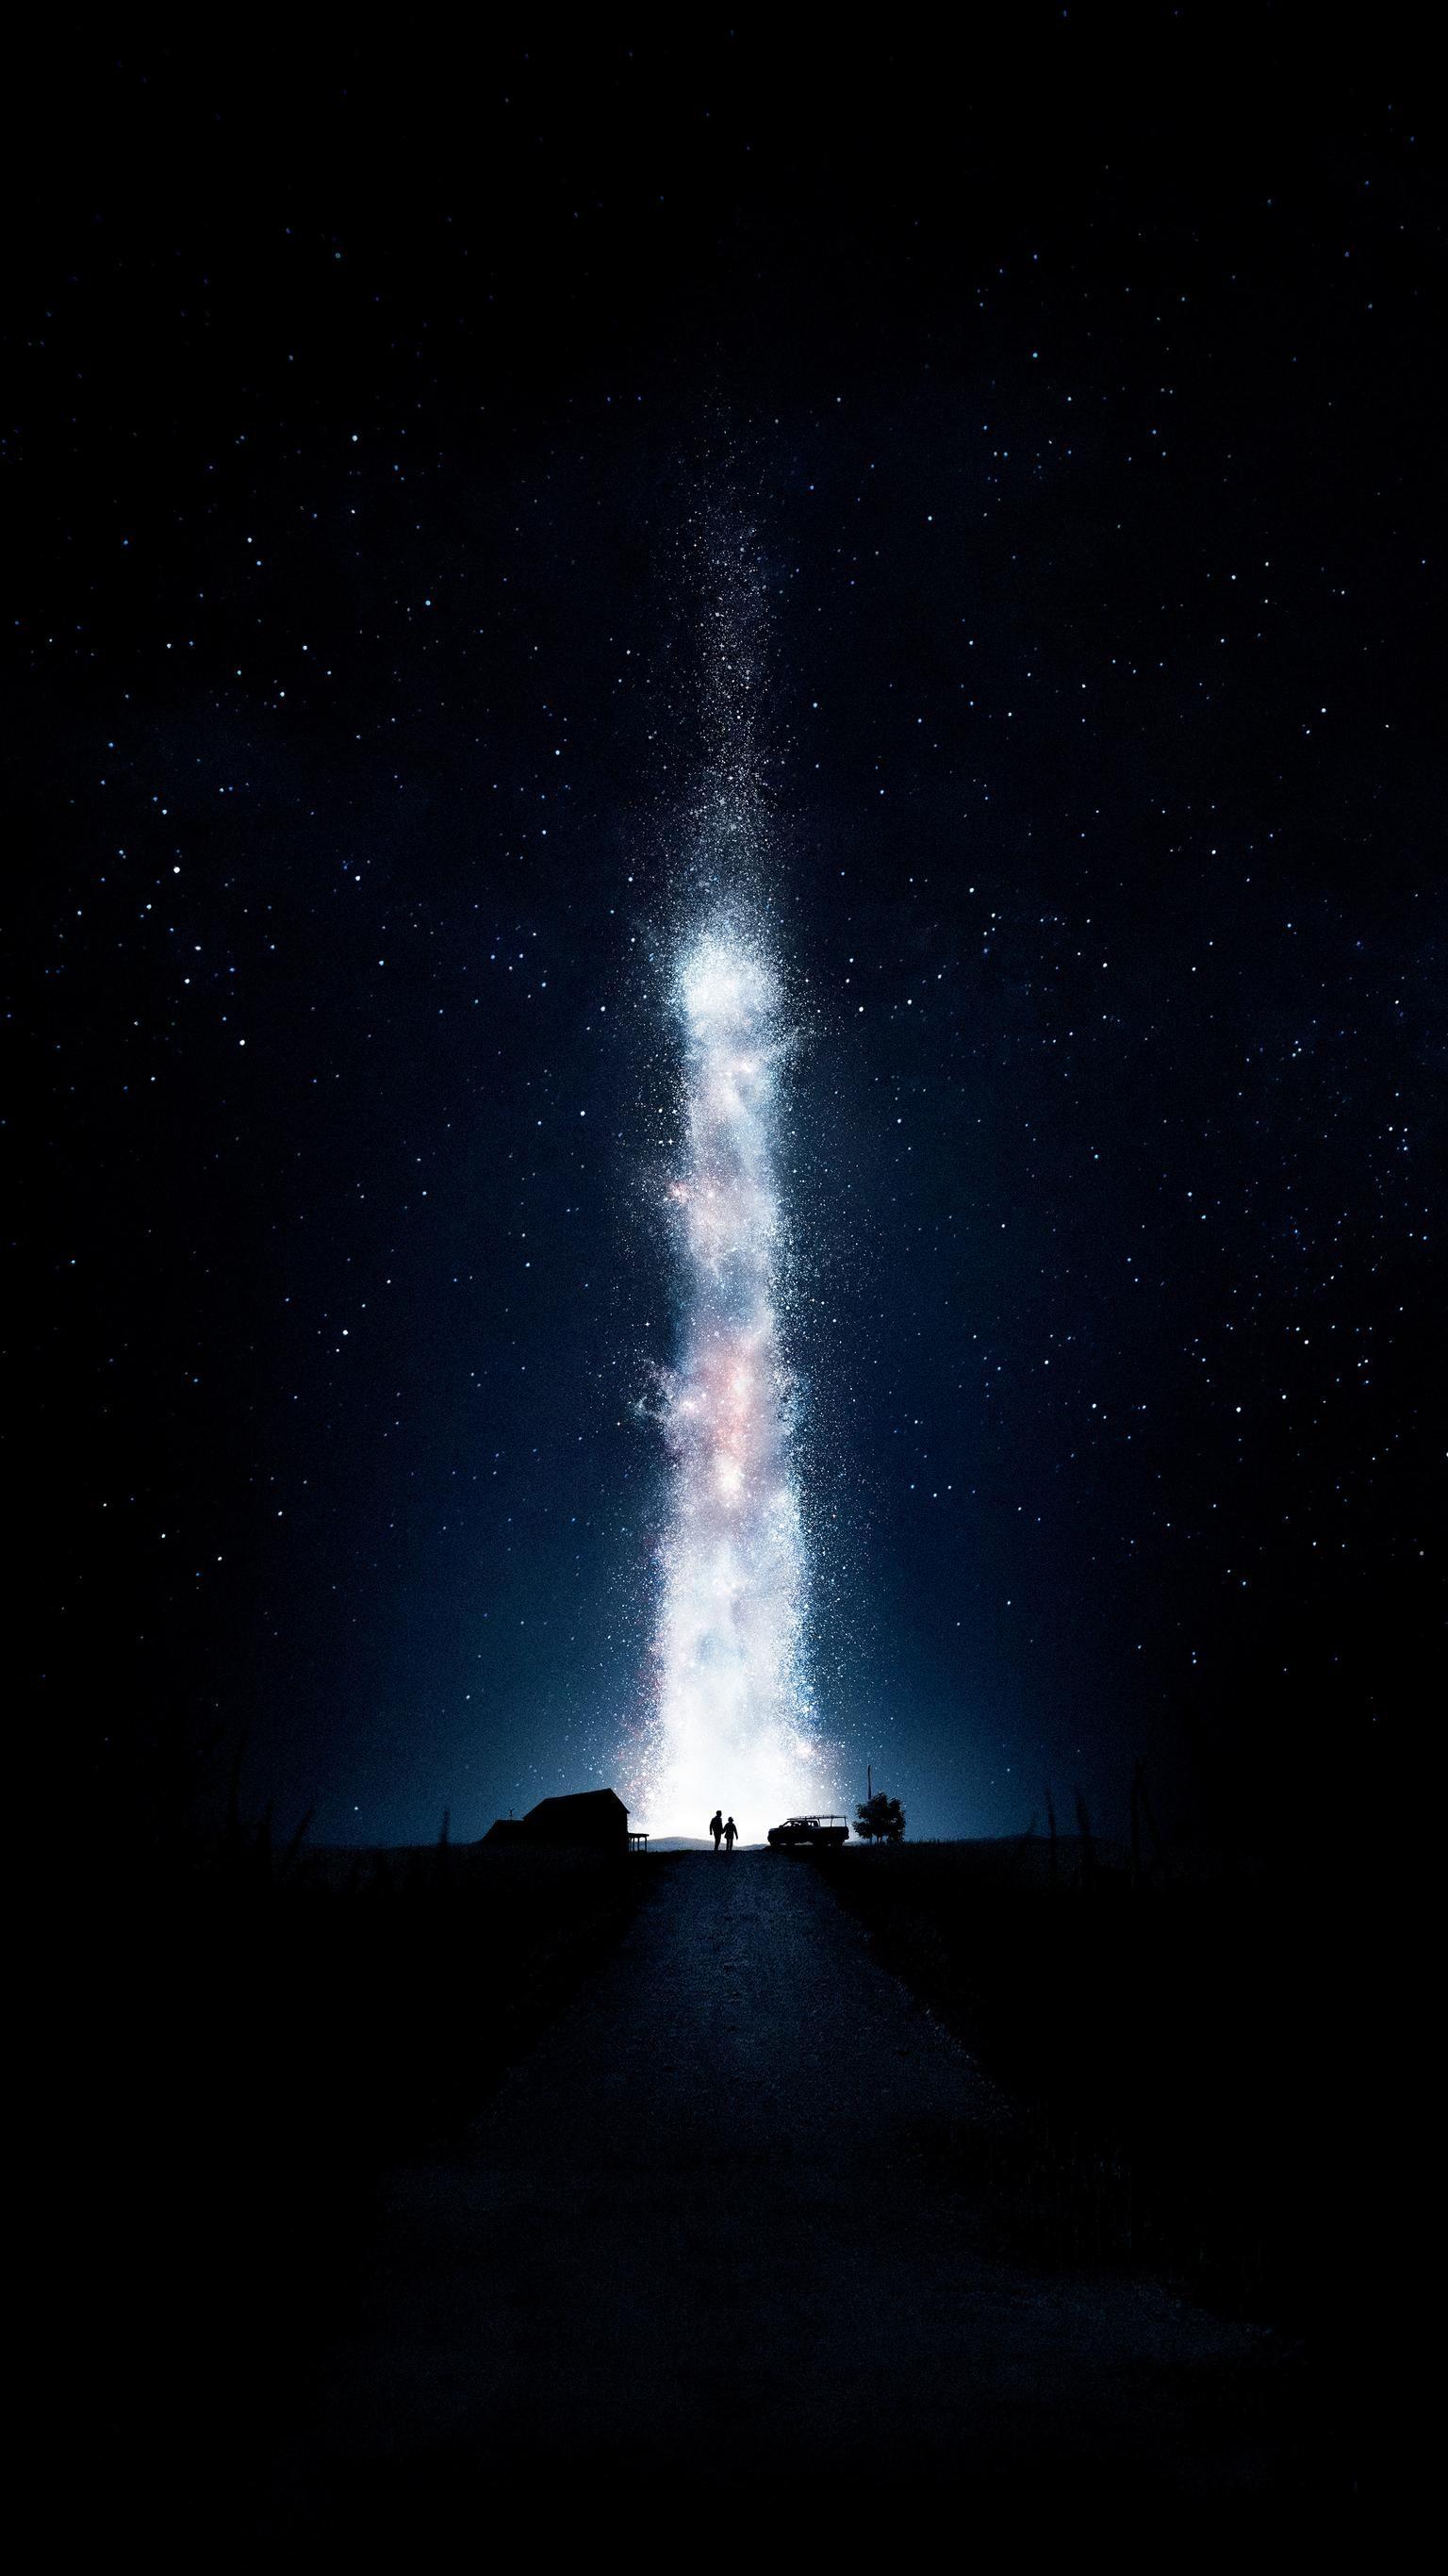 Interstellar 2014 Phone Wallpaper Moviemania Interstellar Movie Wallpapers Interstellar Movie